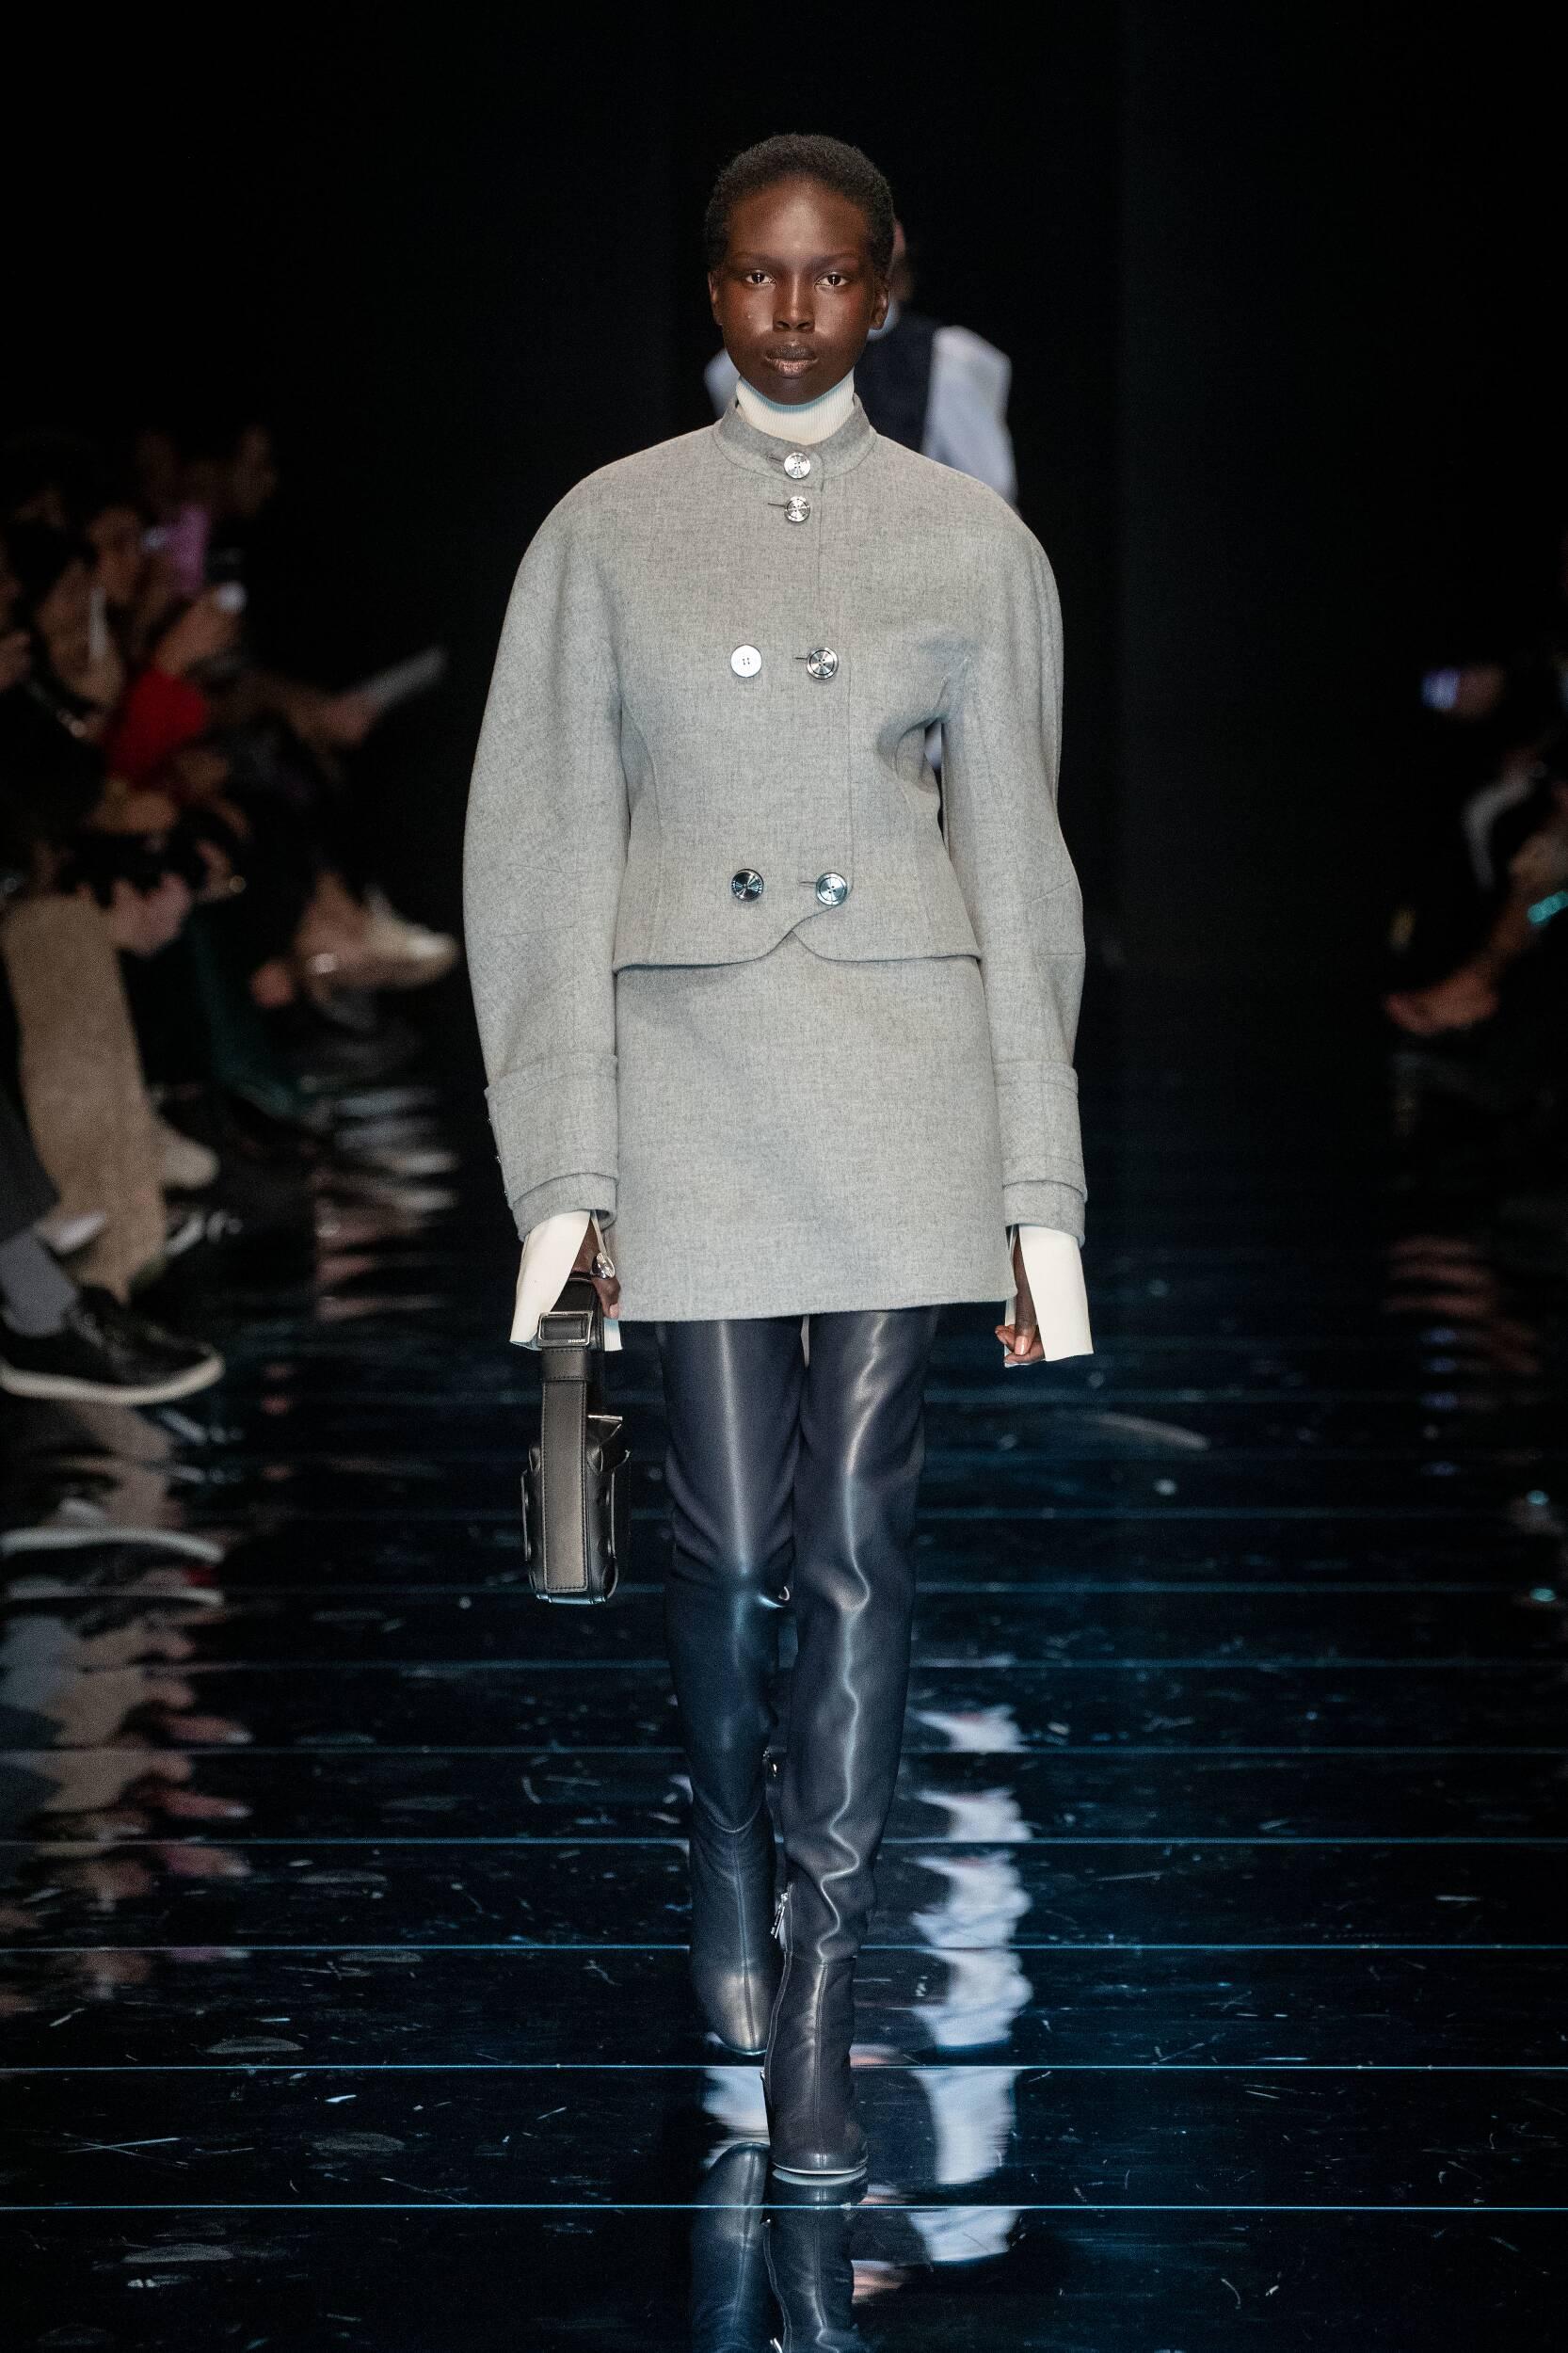 Fashion Model Sportmax Catwalk